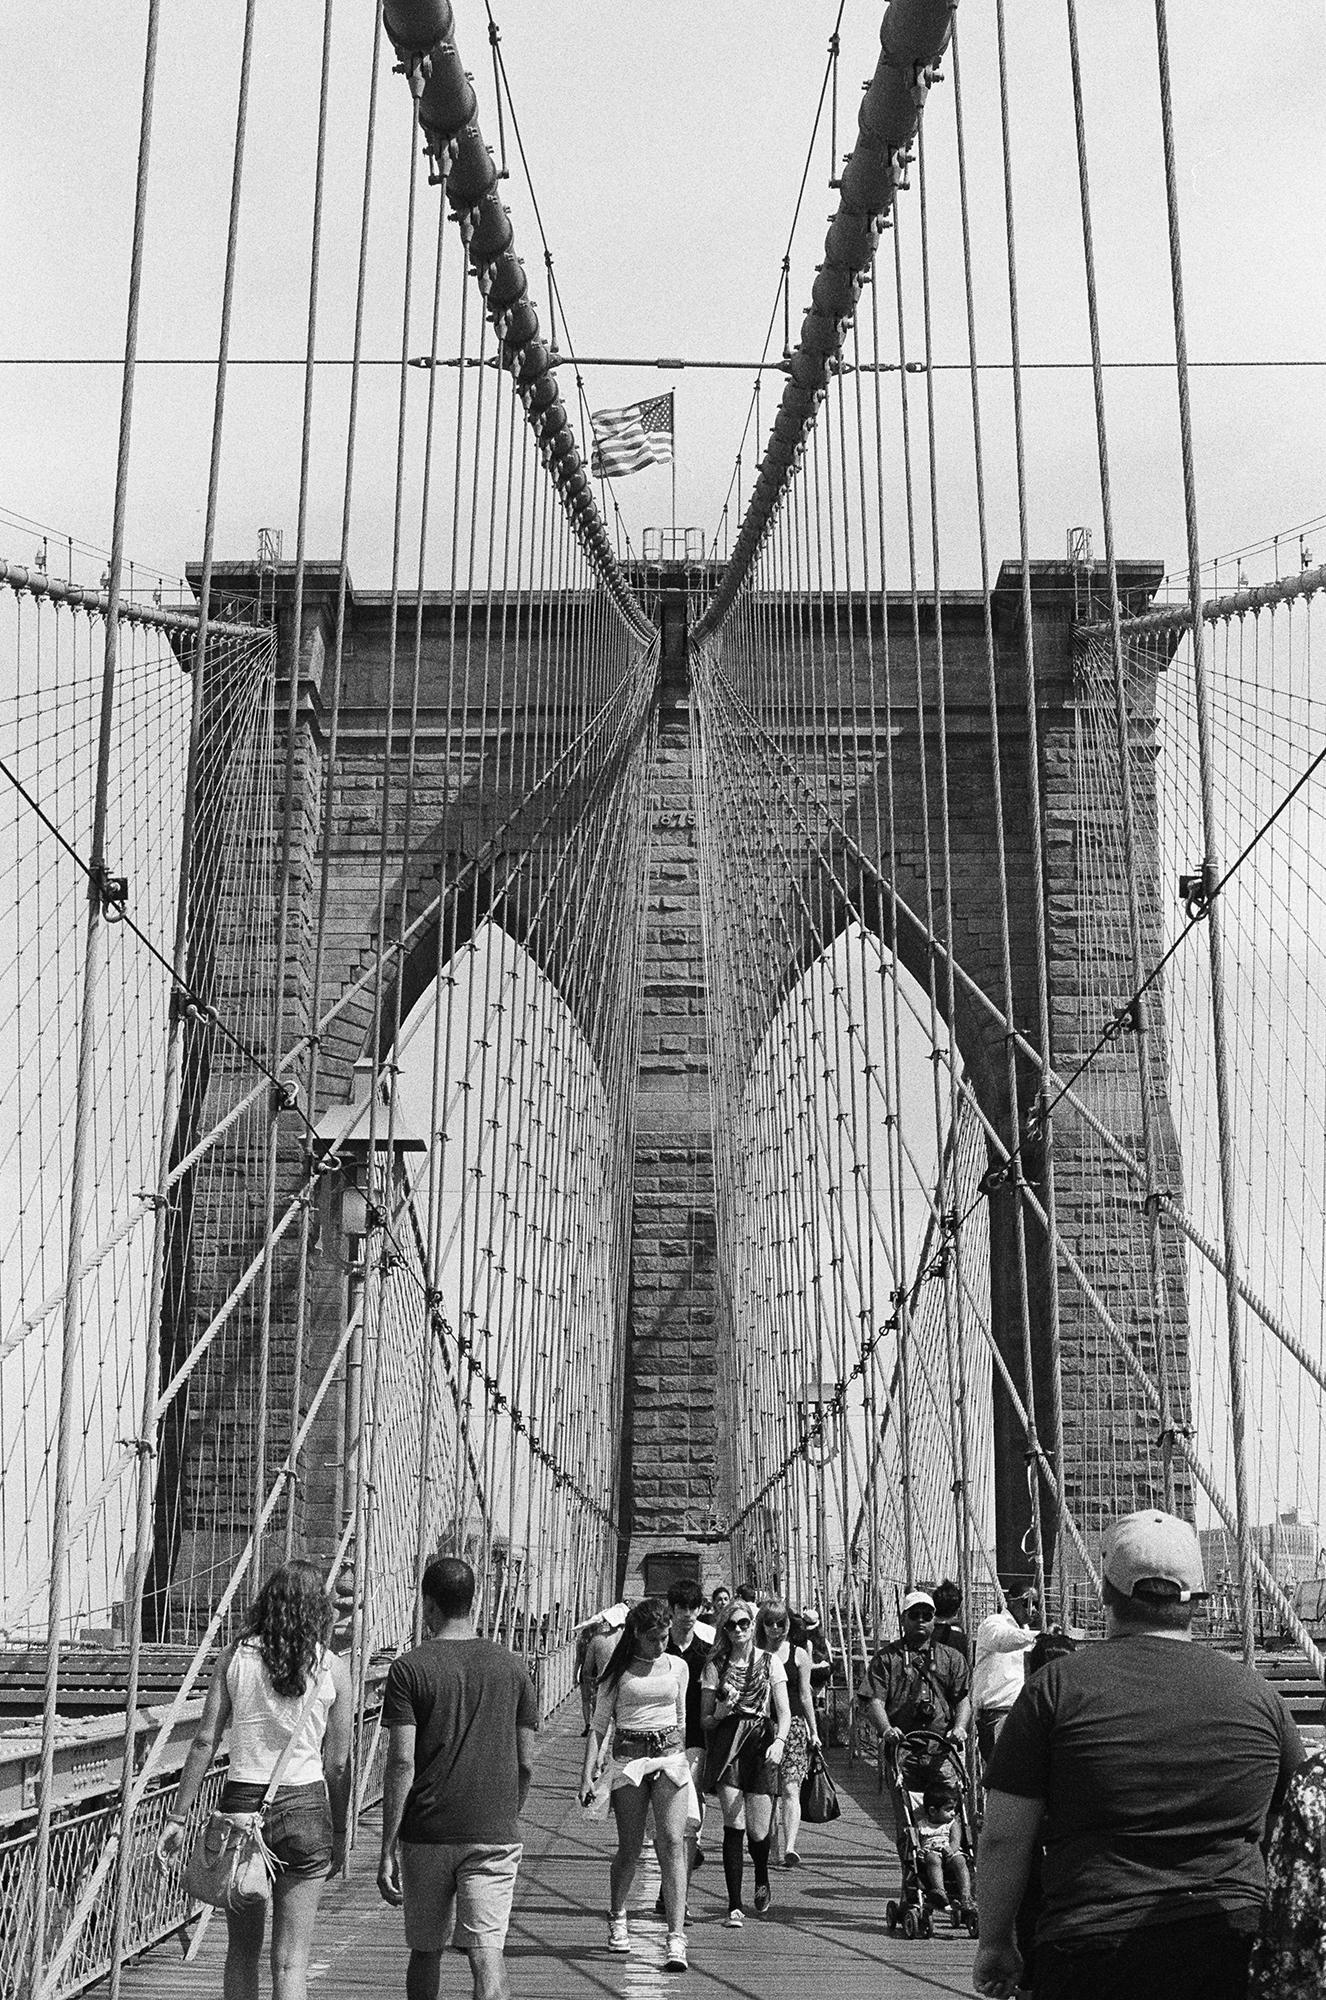 the classic brooklyn bridge